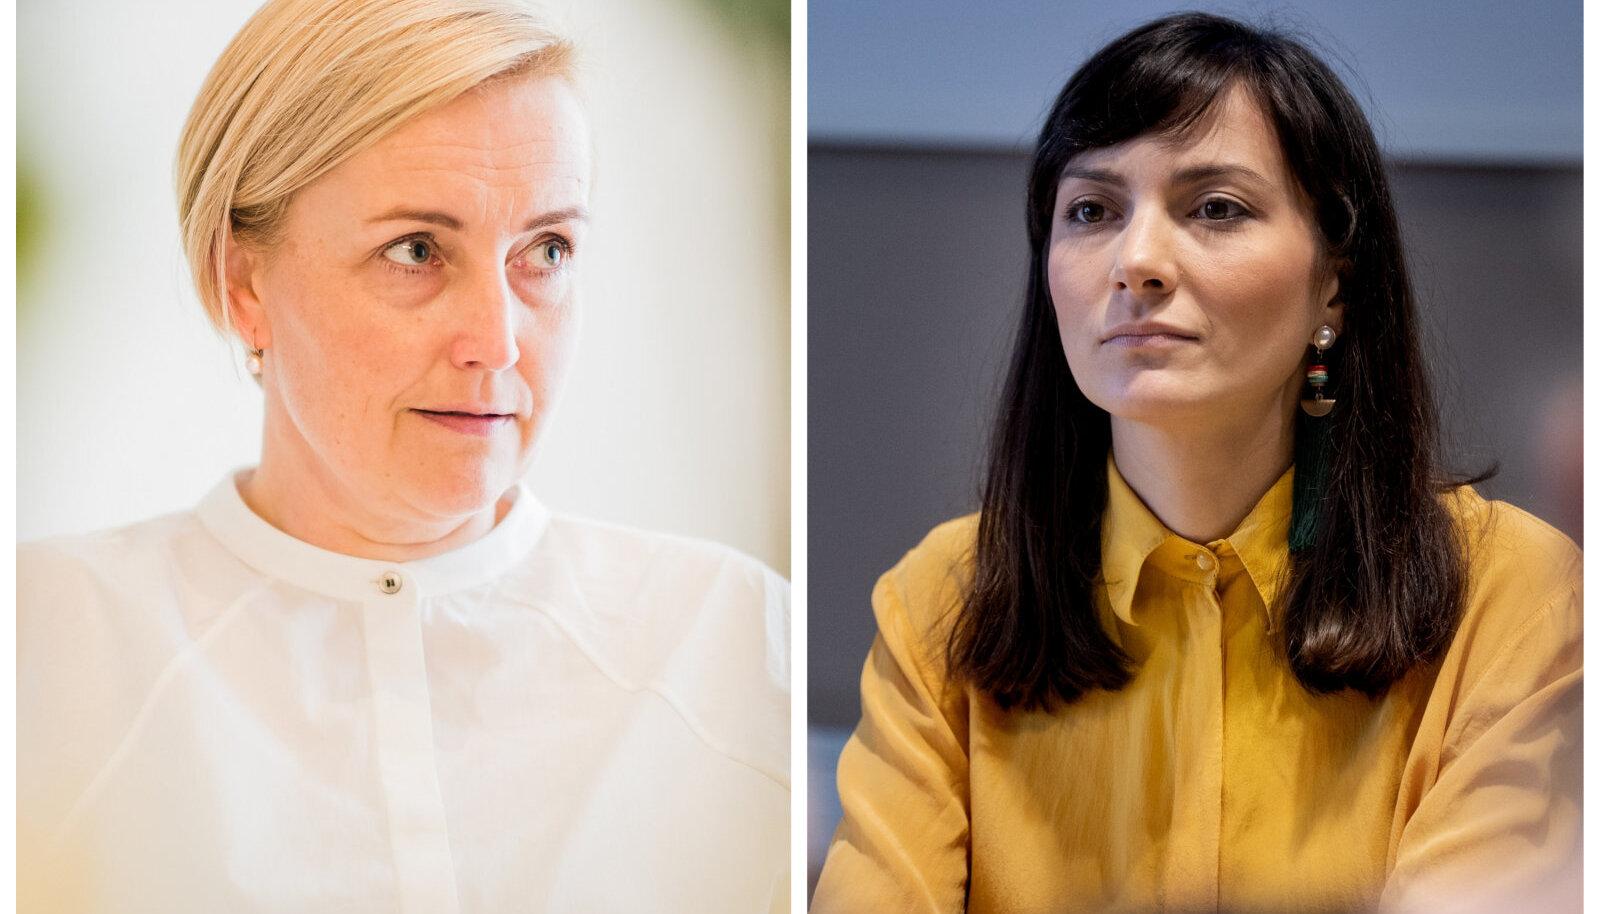 Kristina Kallas ja Züleyxa Izmailova